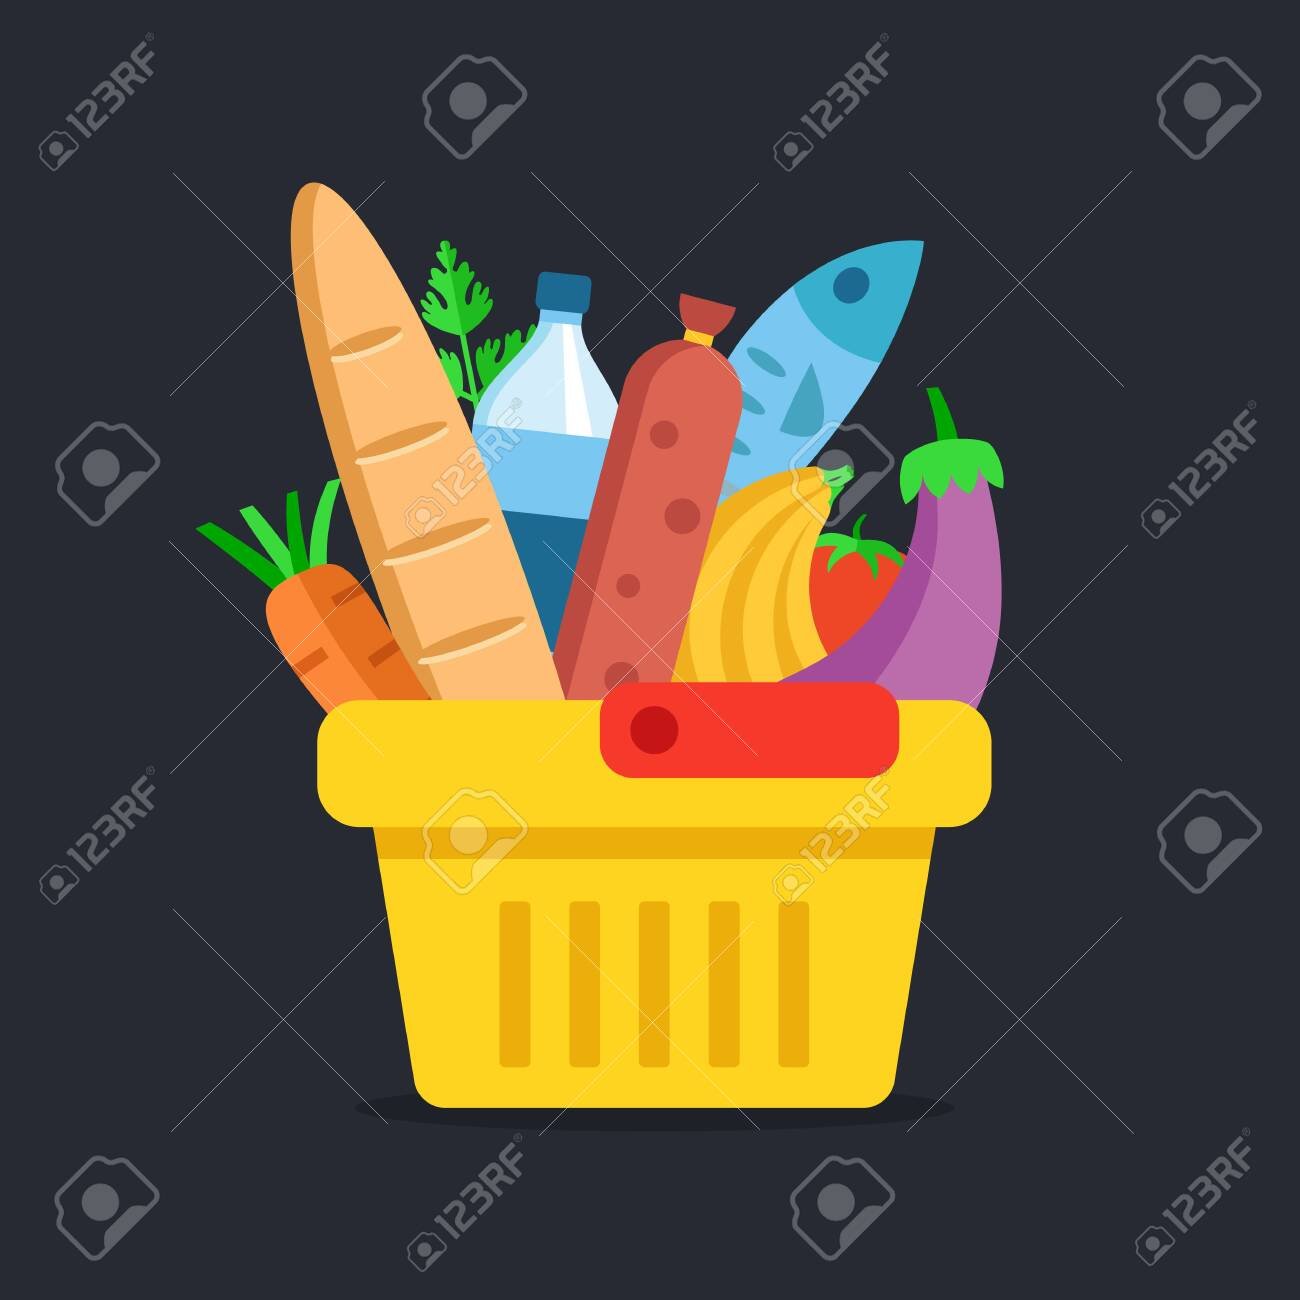 Shopping basket with food. Grocery, supermarket concepts. Flat design. Vector illustration - 121498730